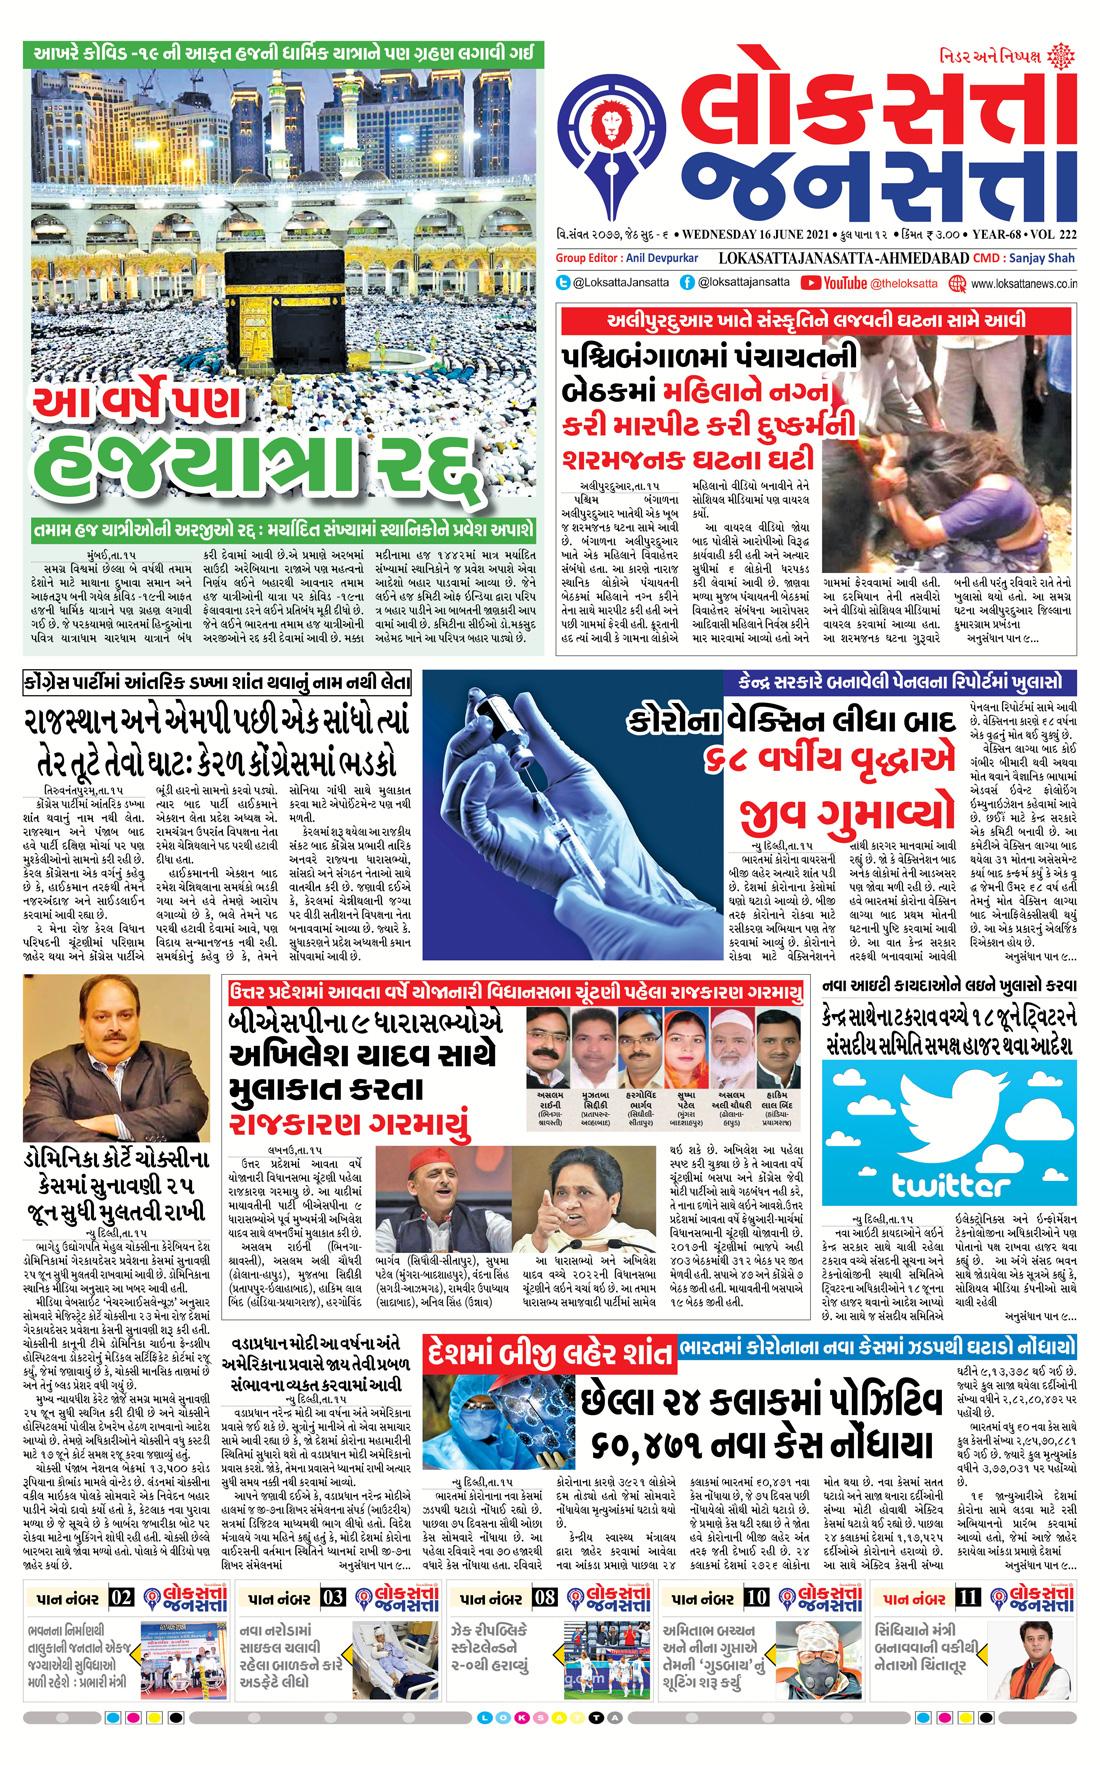 Loksatta Jansatta News Papaer E-paper dated 2021-06-16 | Page 1